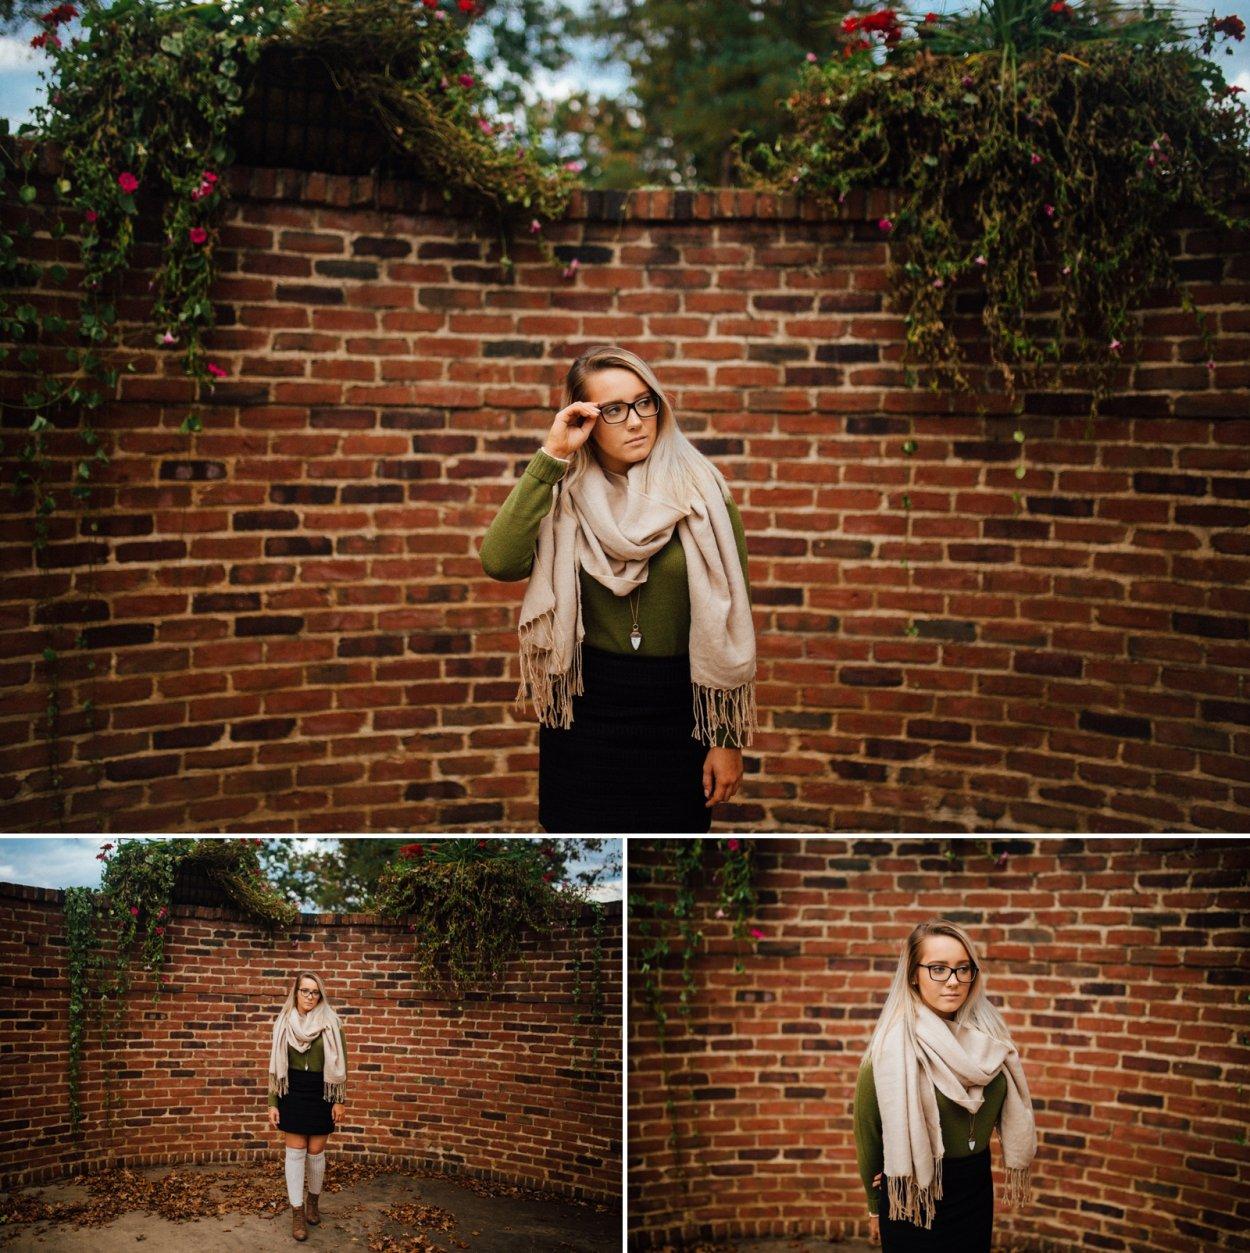 wild-native-photography-pittsburgh-senior-portrait-photographer-erin-oglebay_1580